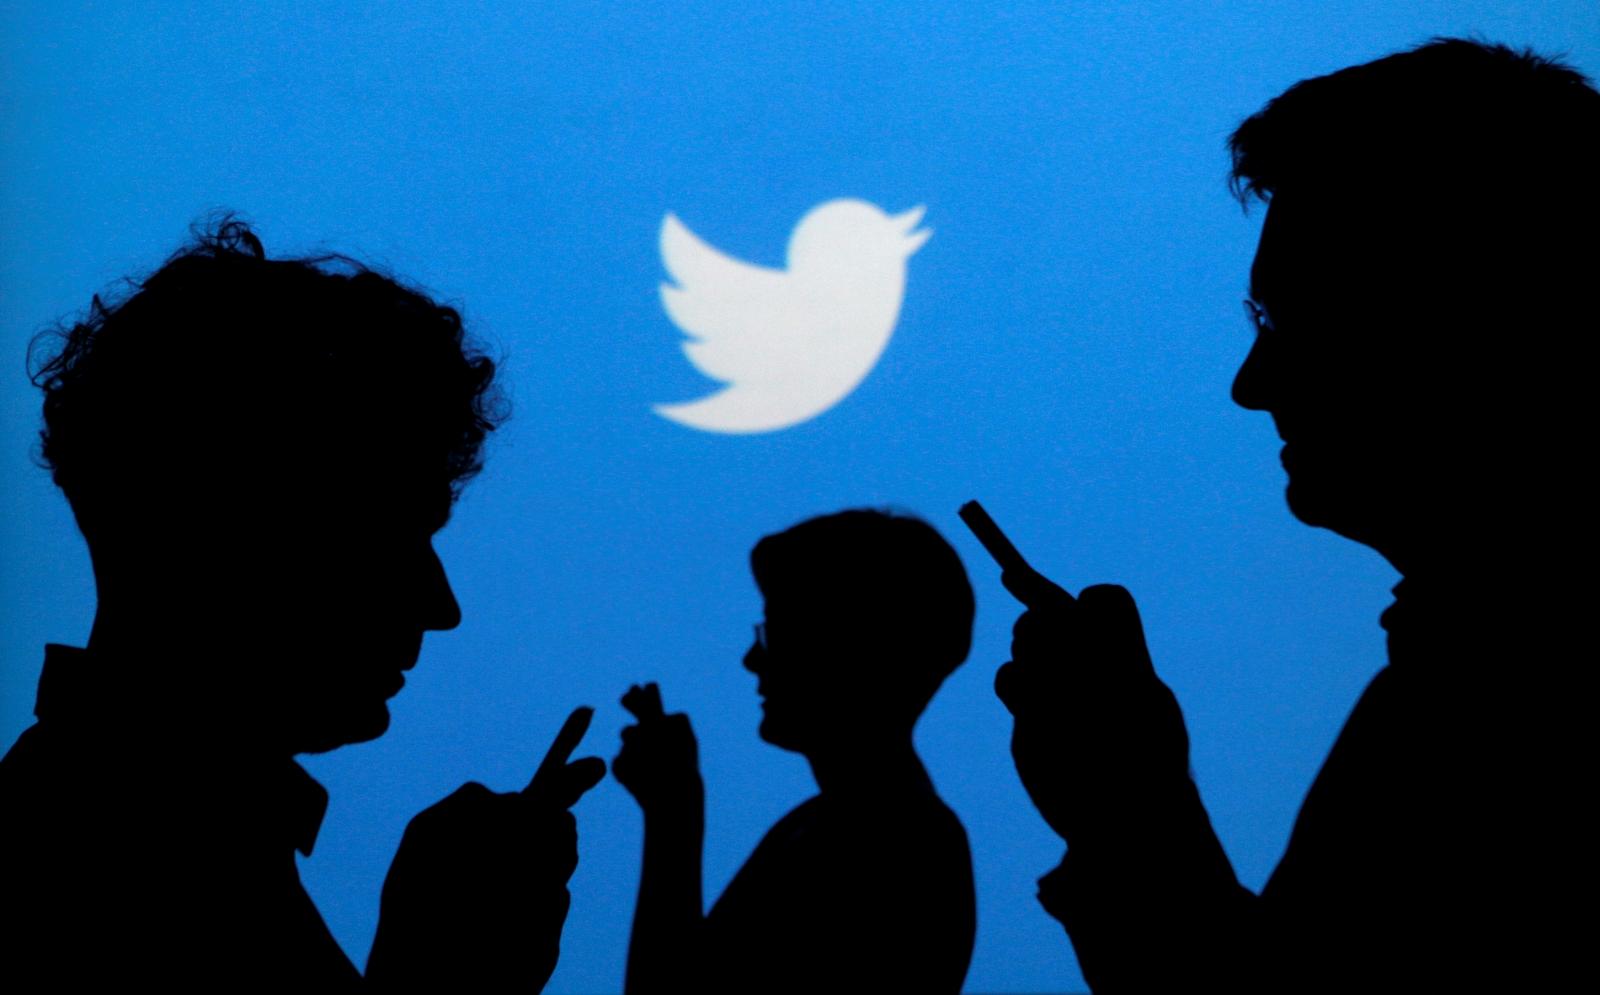 Twitter anti-abuse